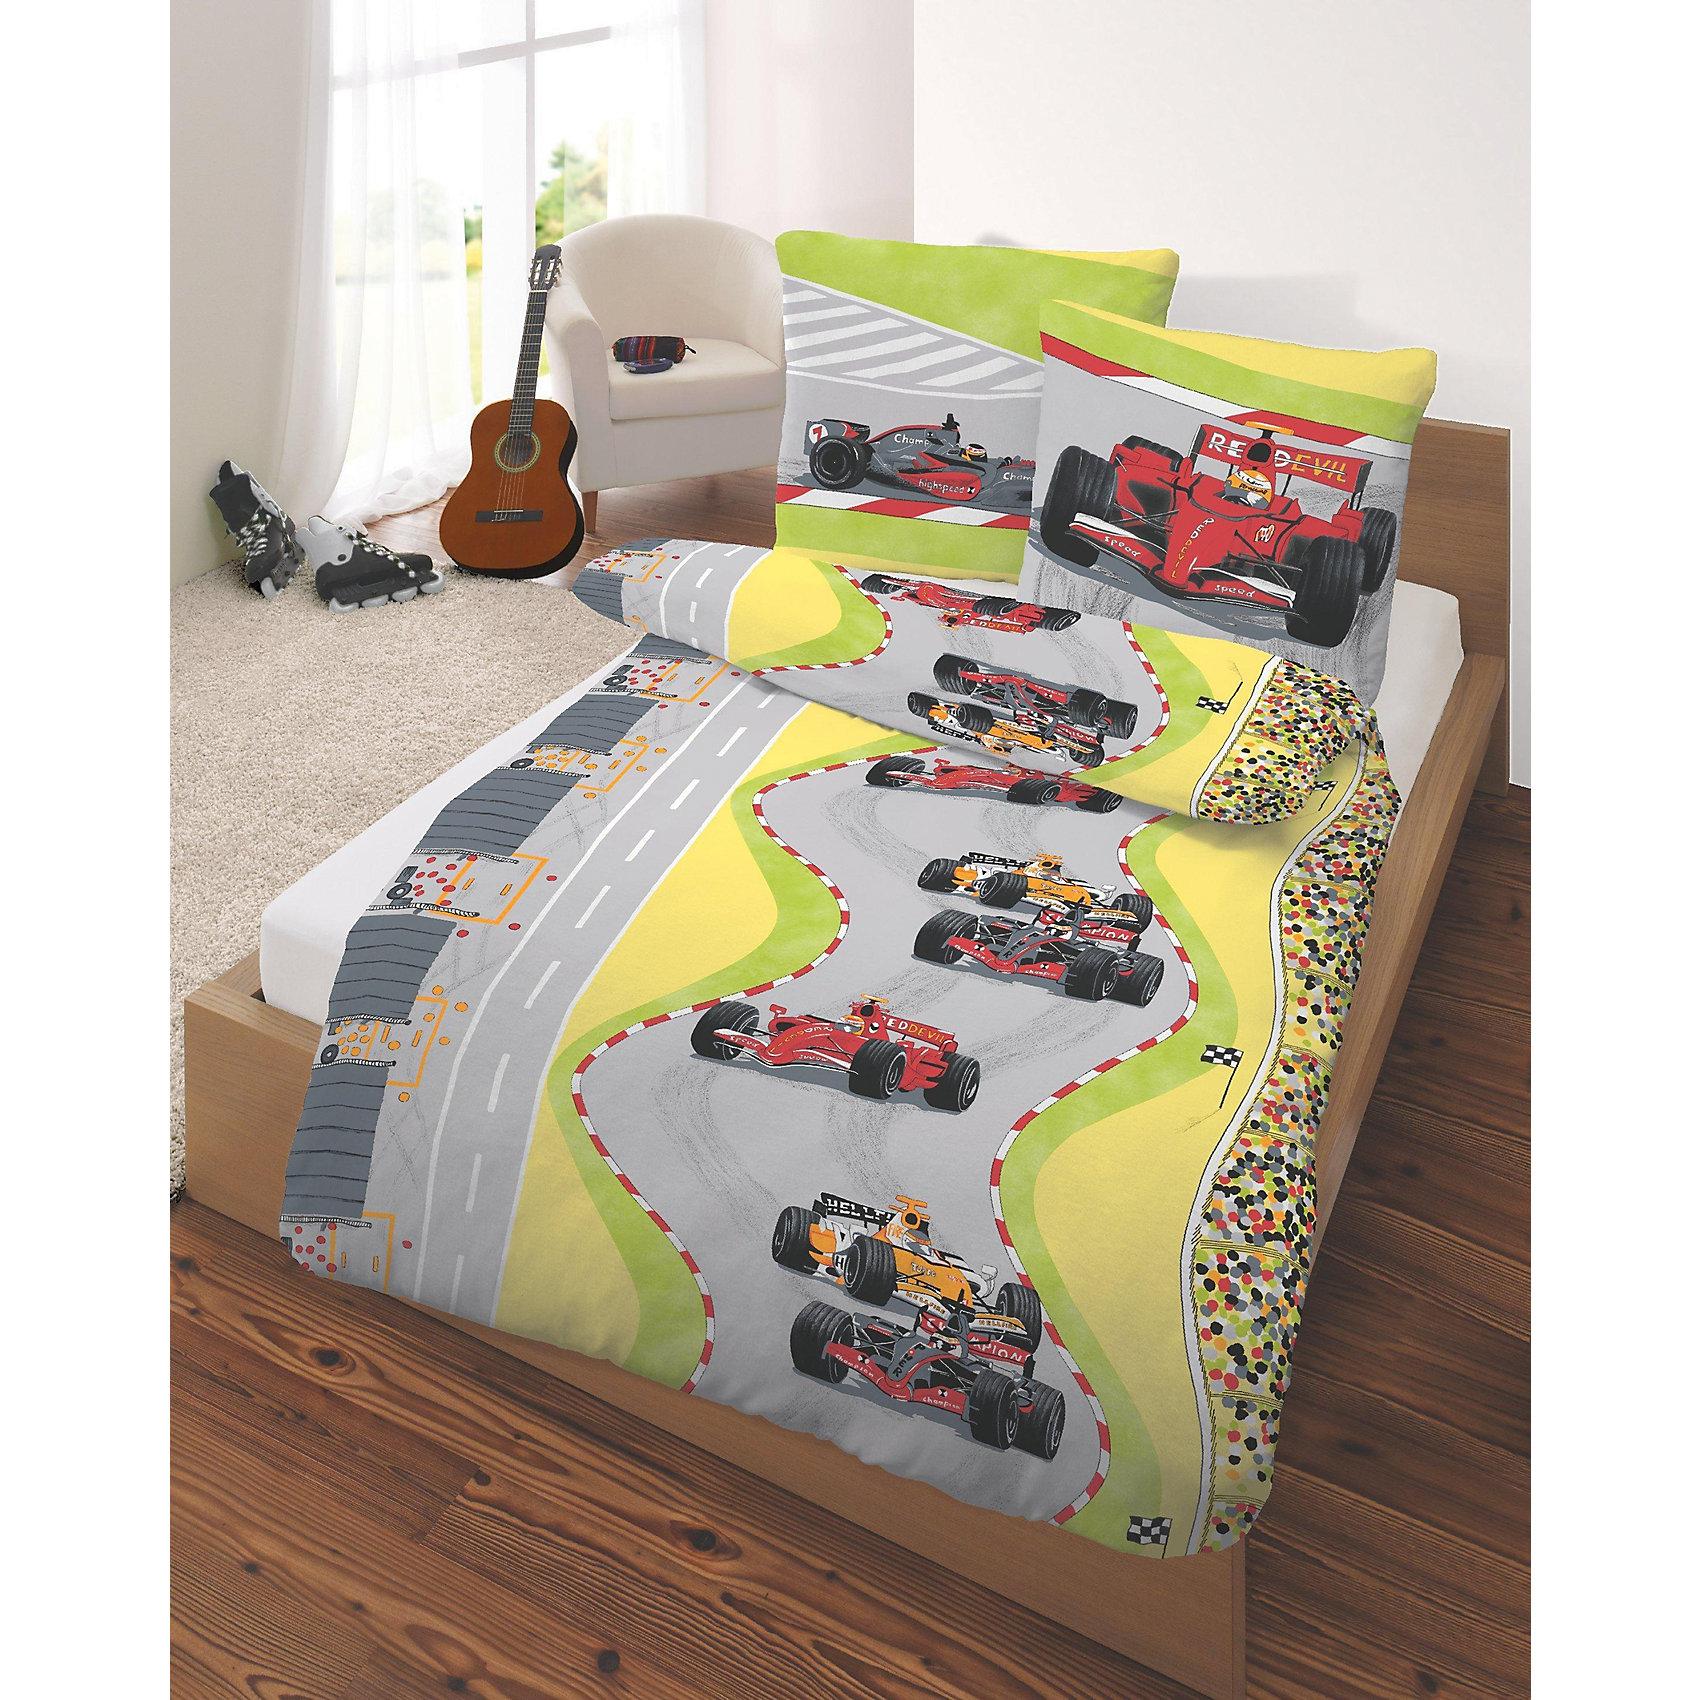 kinderbettwaesche rennwagen cretonne rot 135 x 200 cm. Black Bedroom Furniture Sets. Home Design Ideas